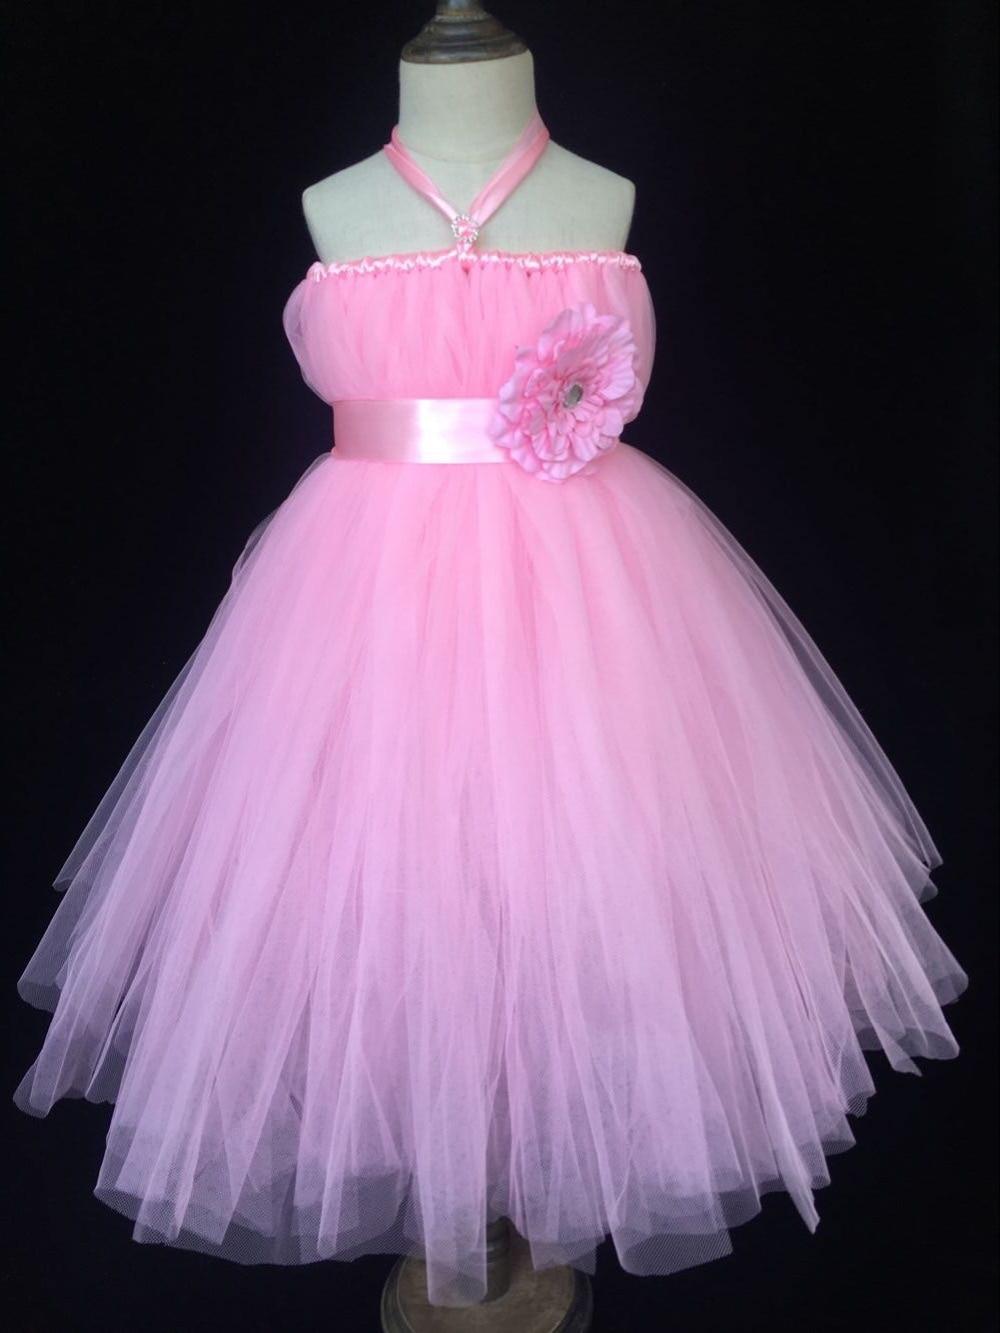 Cute Girls Pink Long Tutu Dress Kids Fluffy Tulle Dress Ball Gown with Flower Ribbon Bow Headband Children Wedding Party Dress